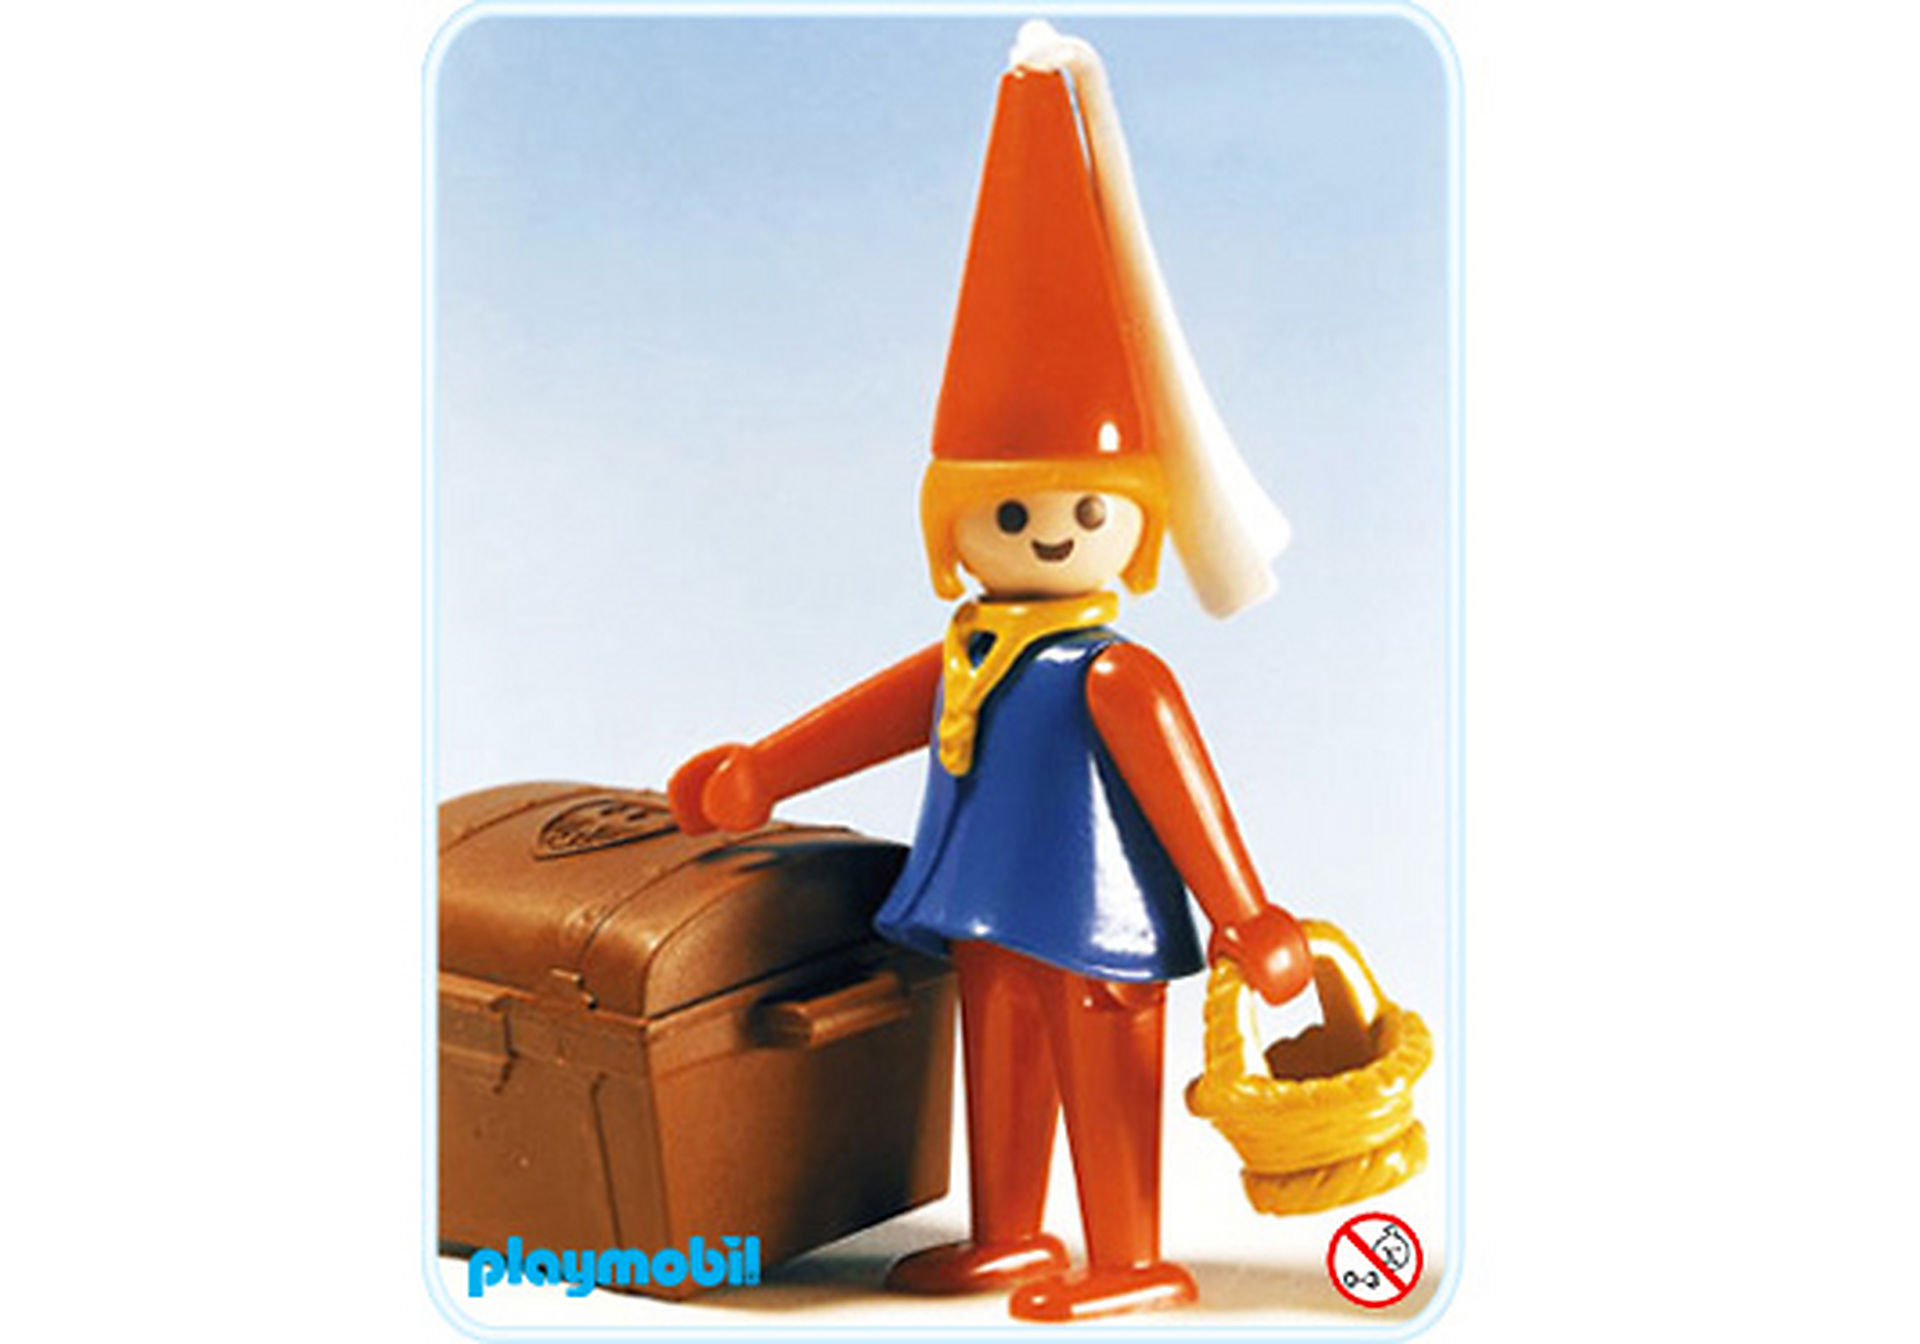 http://media.playmobil.com/i/playmobil/3336-A_product_detail/Burgfräulein/Schatztruhe